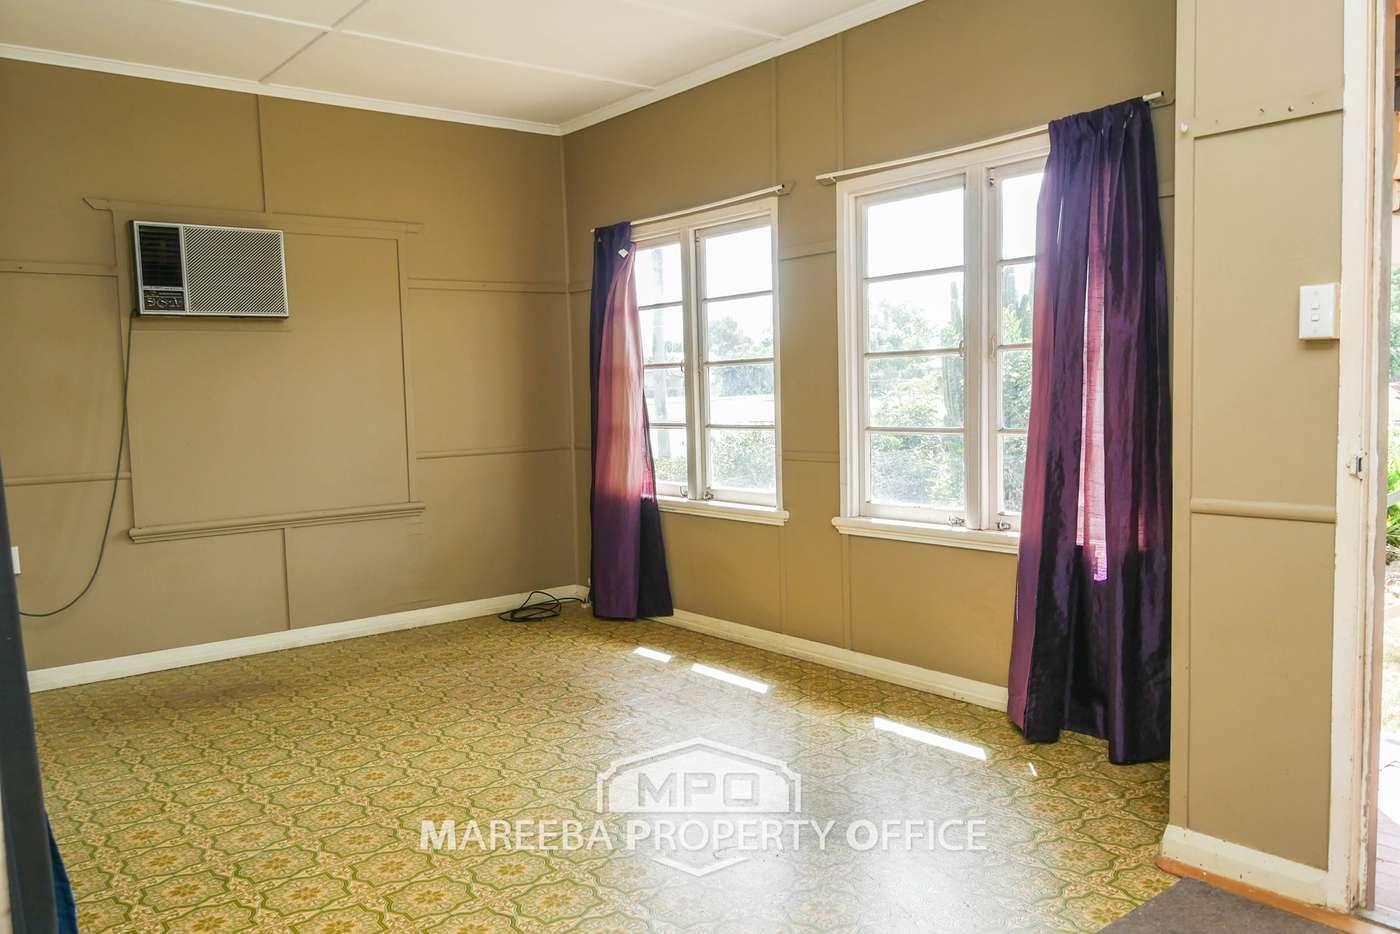 Sixth view of Homely house listing, 112 Mason Street, Mareeba QLD 4880